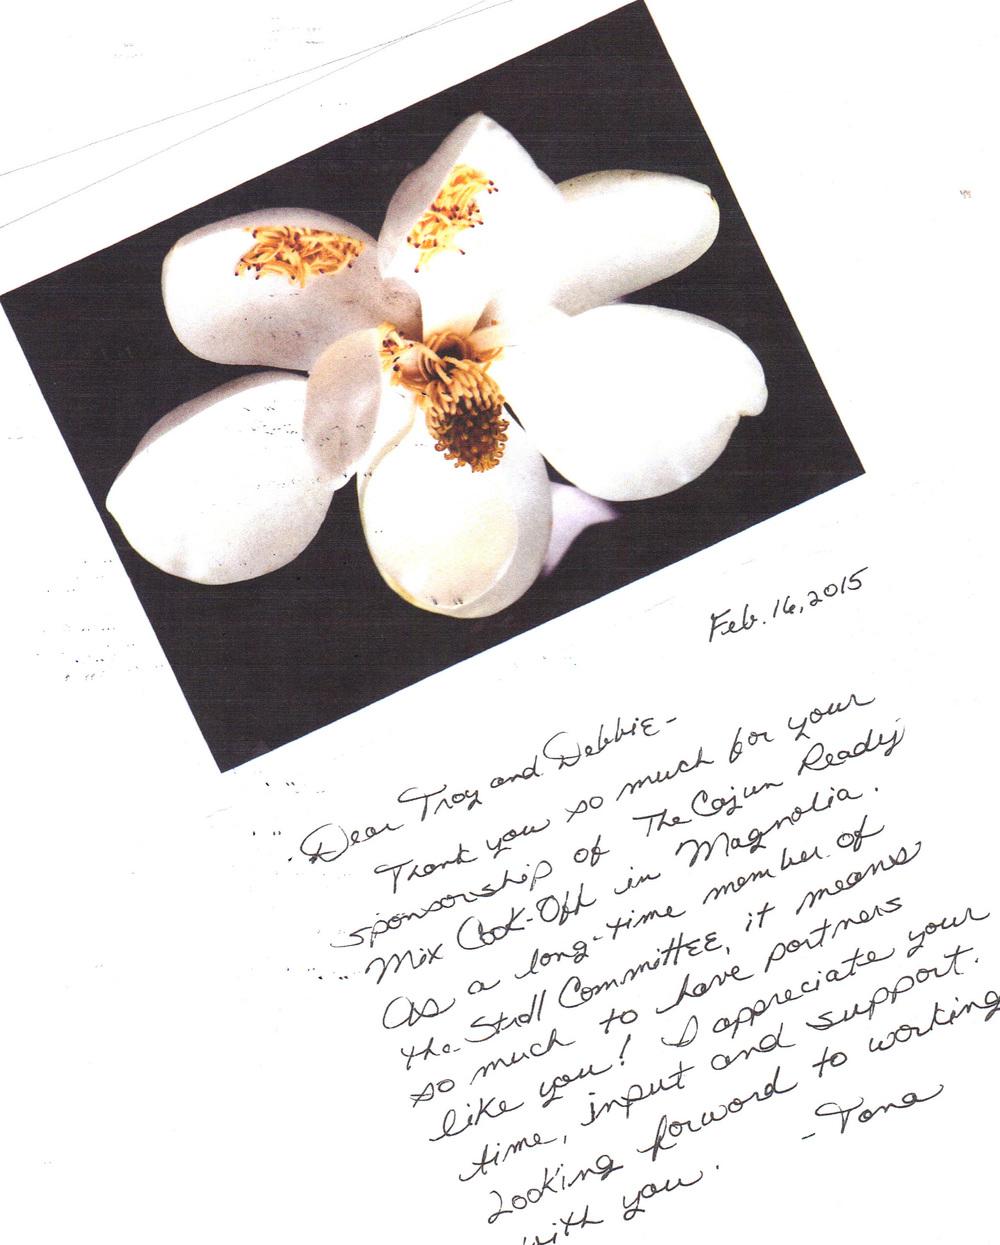 Magnolia on the Stroll Thank You Card 02 16 15.JPG